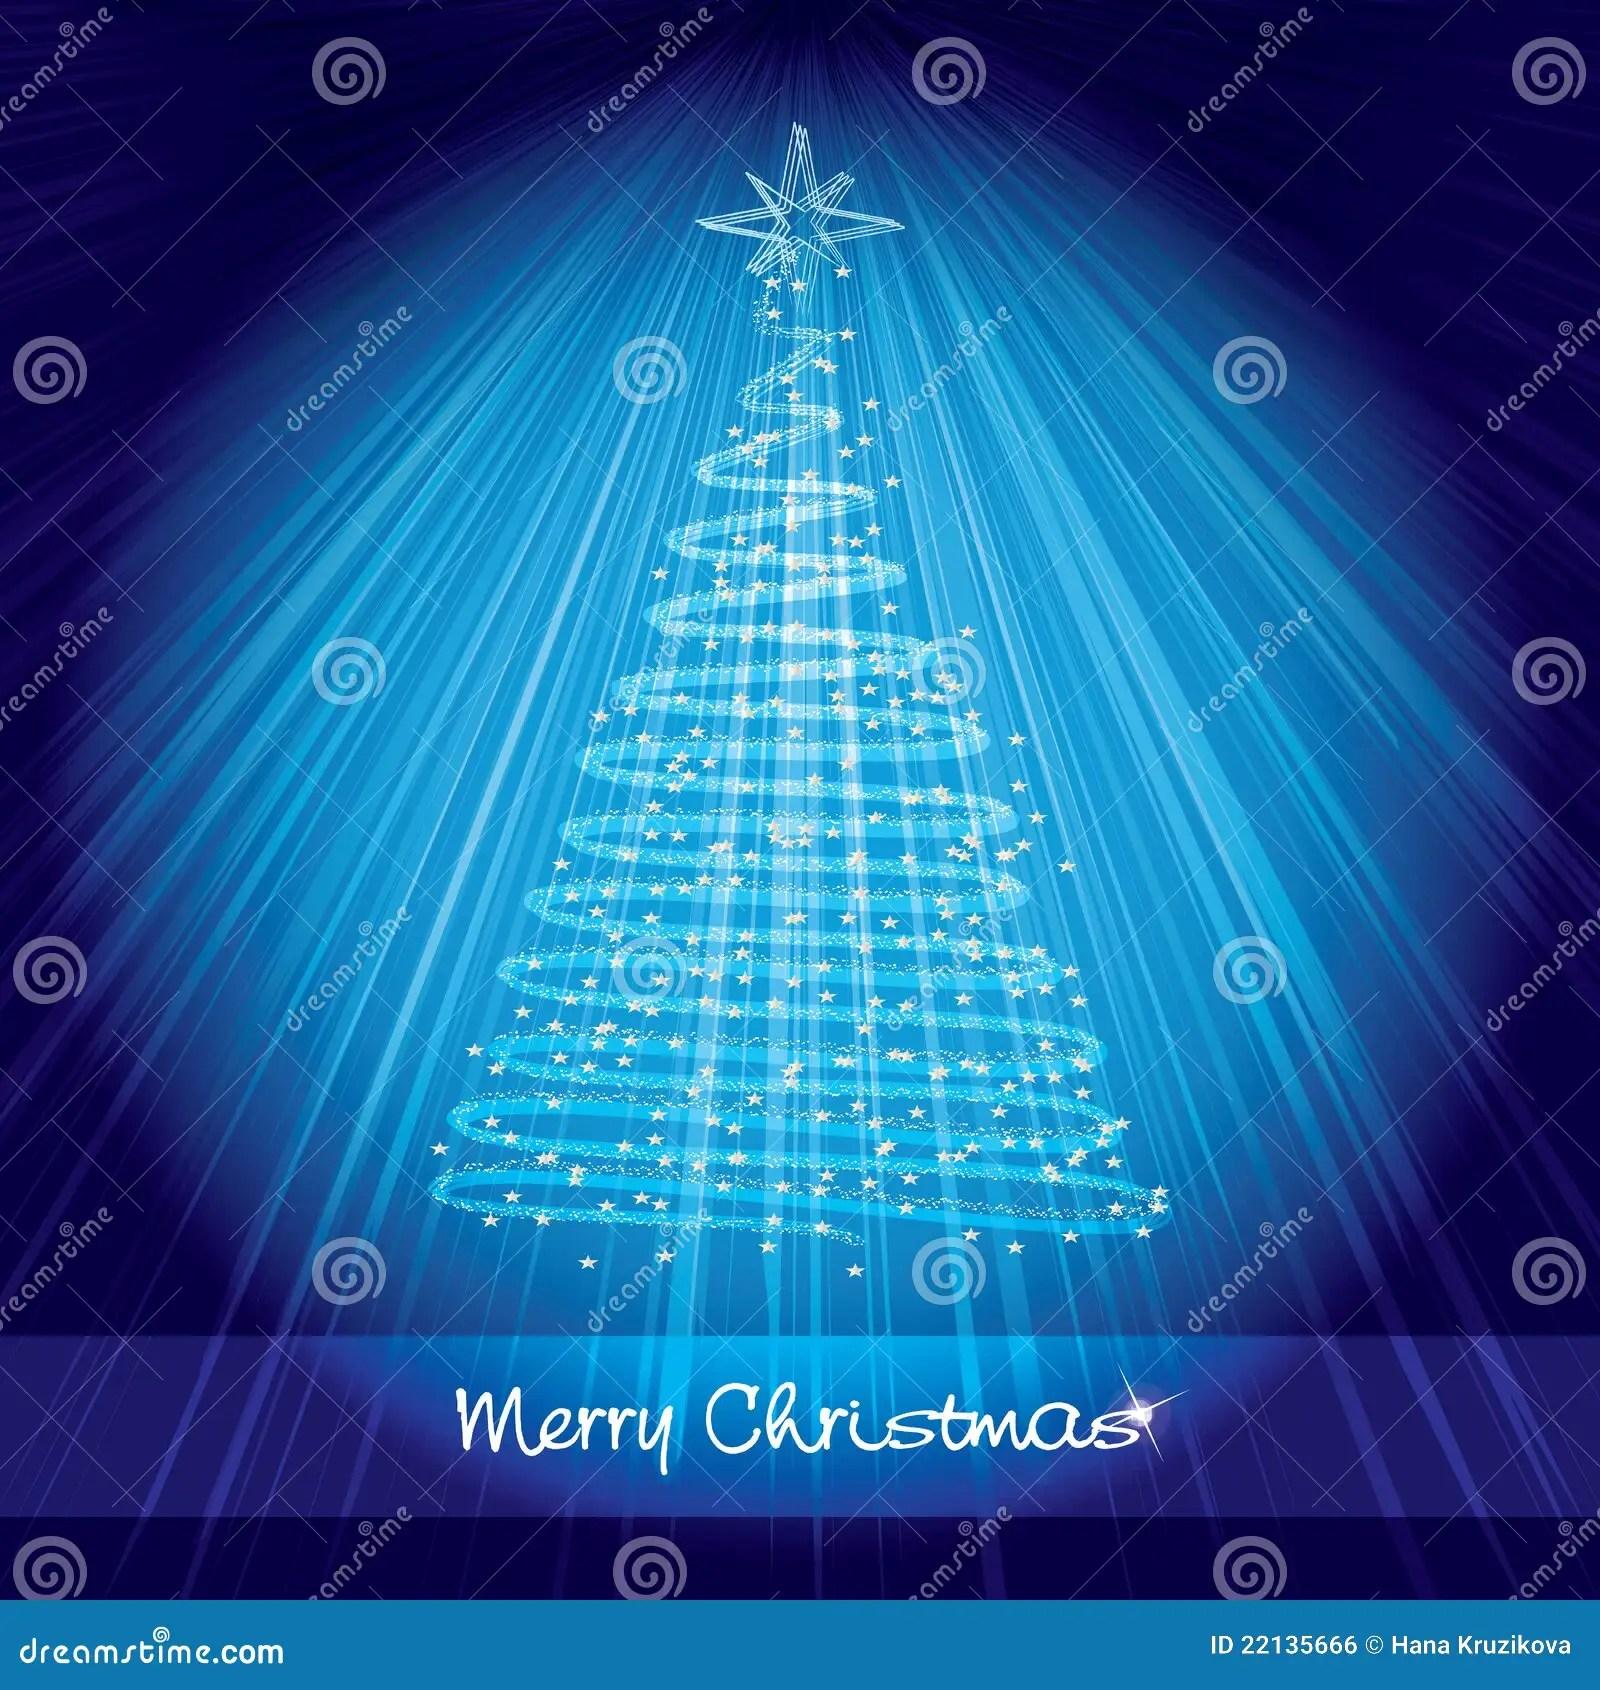 Blue Christmas Card With Shining Christmas Tree Stock